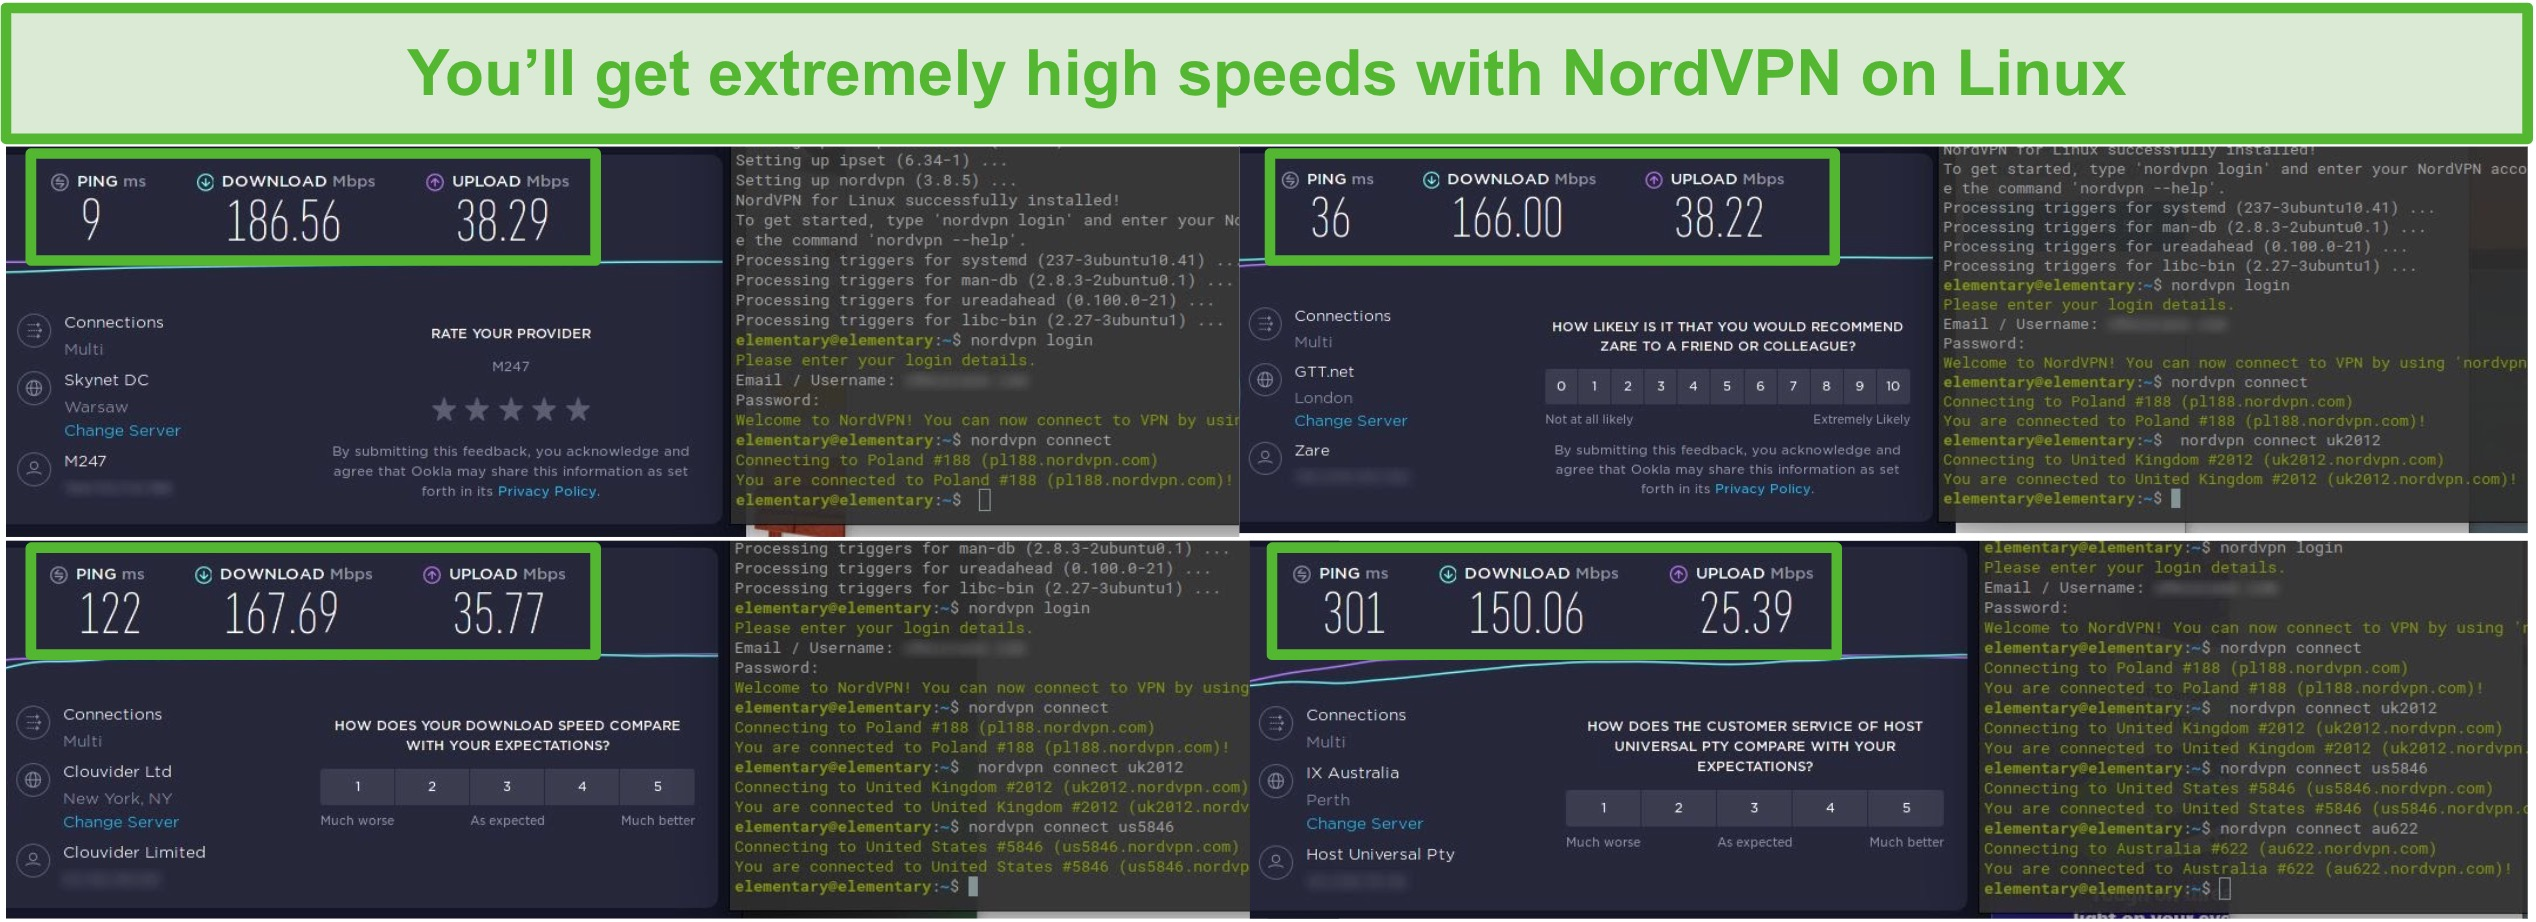 Screenshot of NordVPN speed tests on Poland, UK, US, and Australia servers.